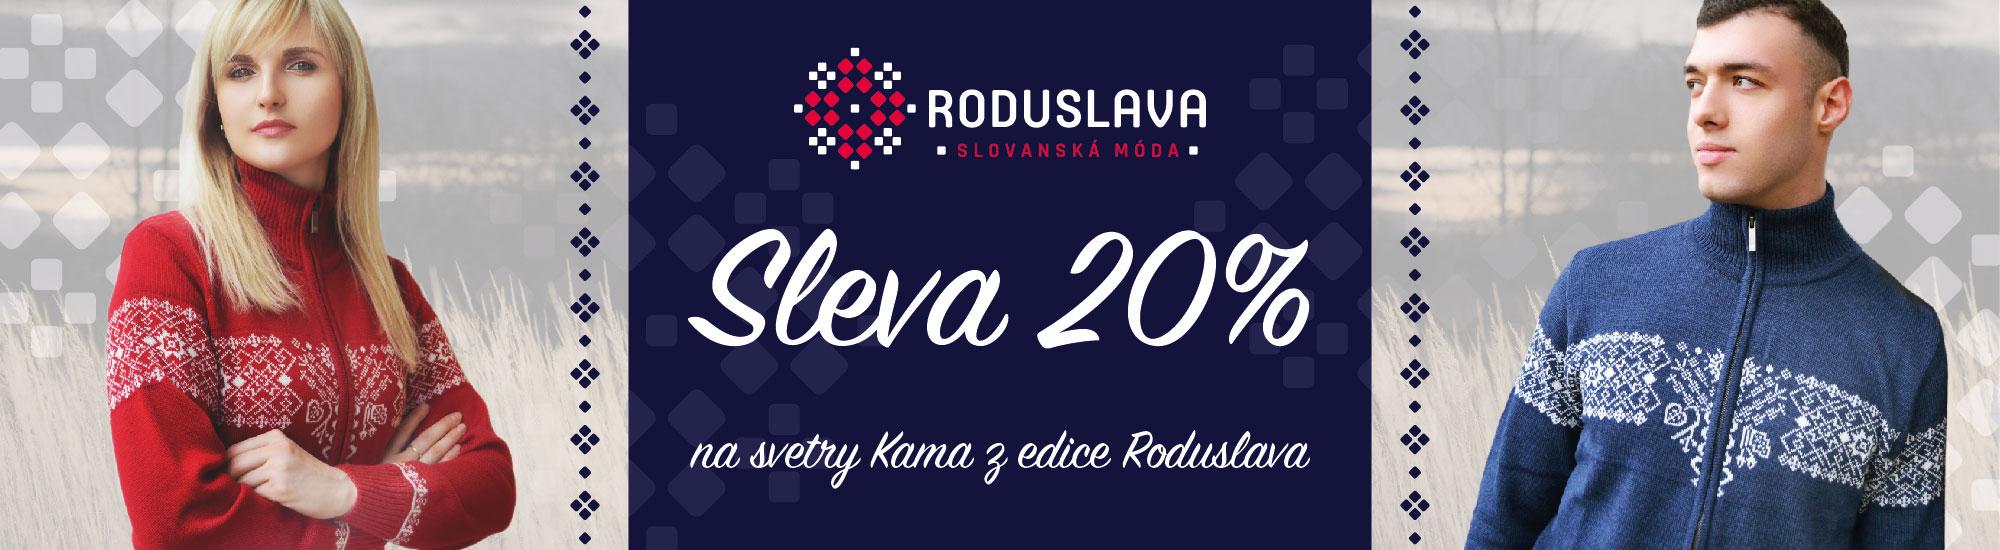 Kama svetry od Roduslavy se slevou 20%